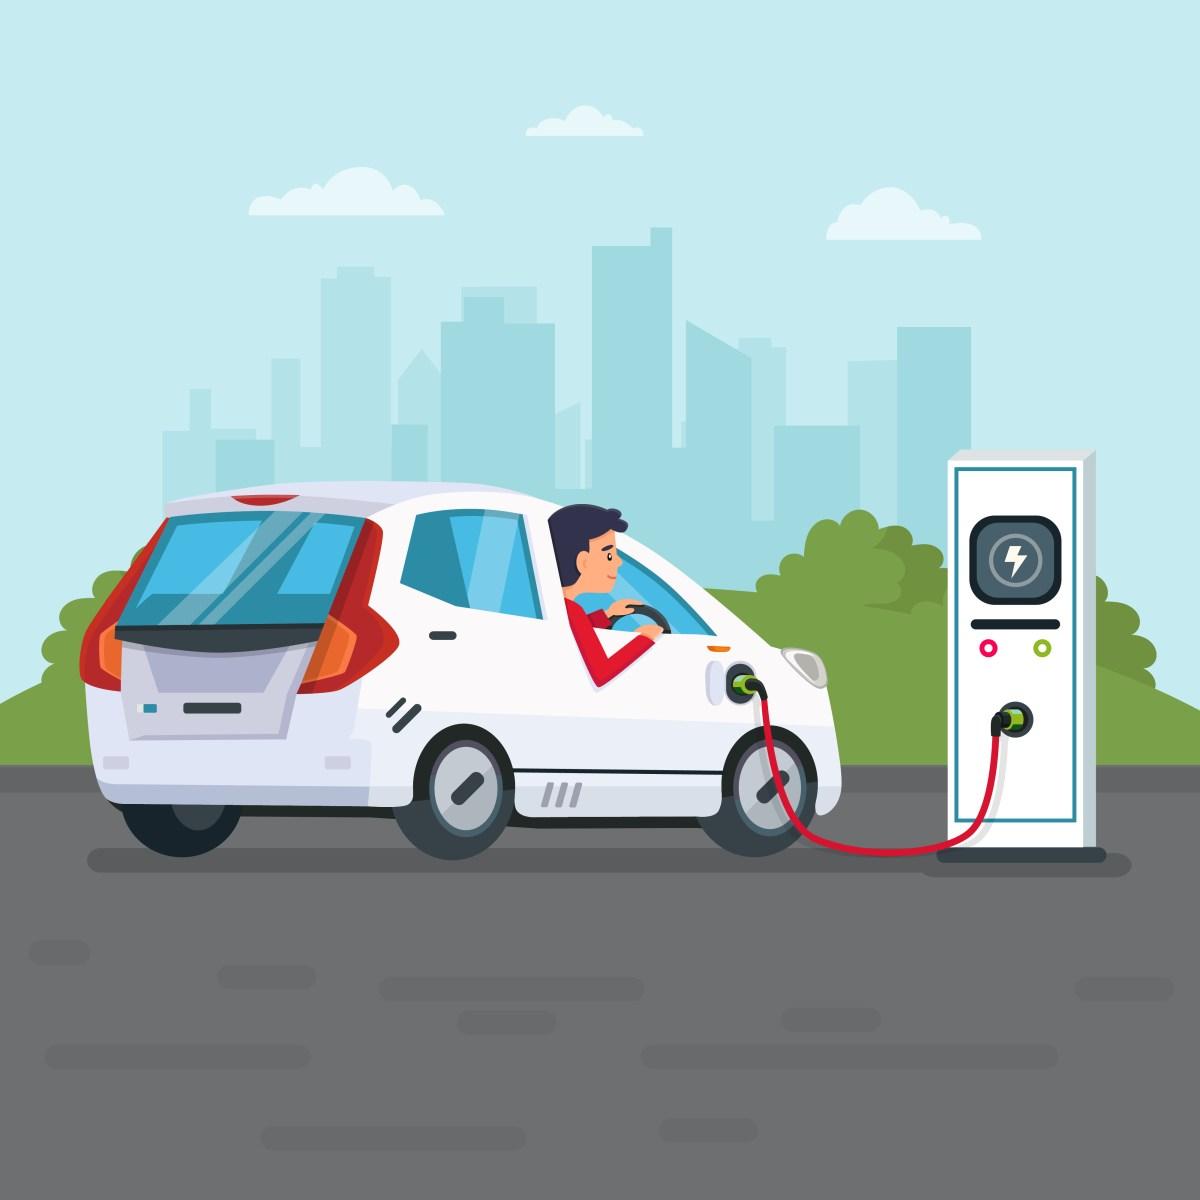 e-charging stations